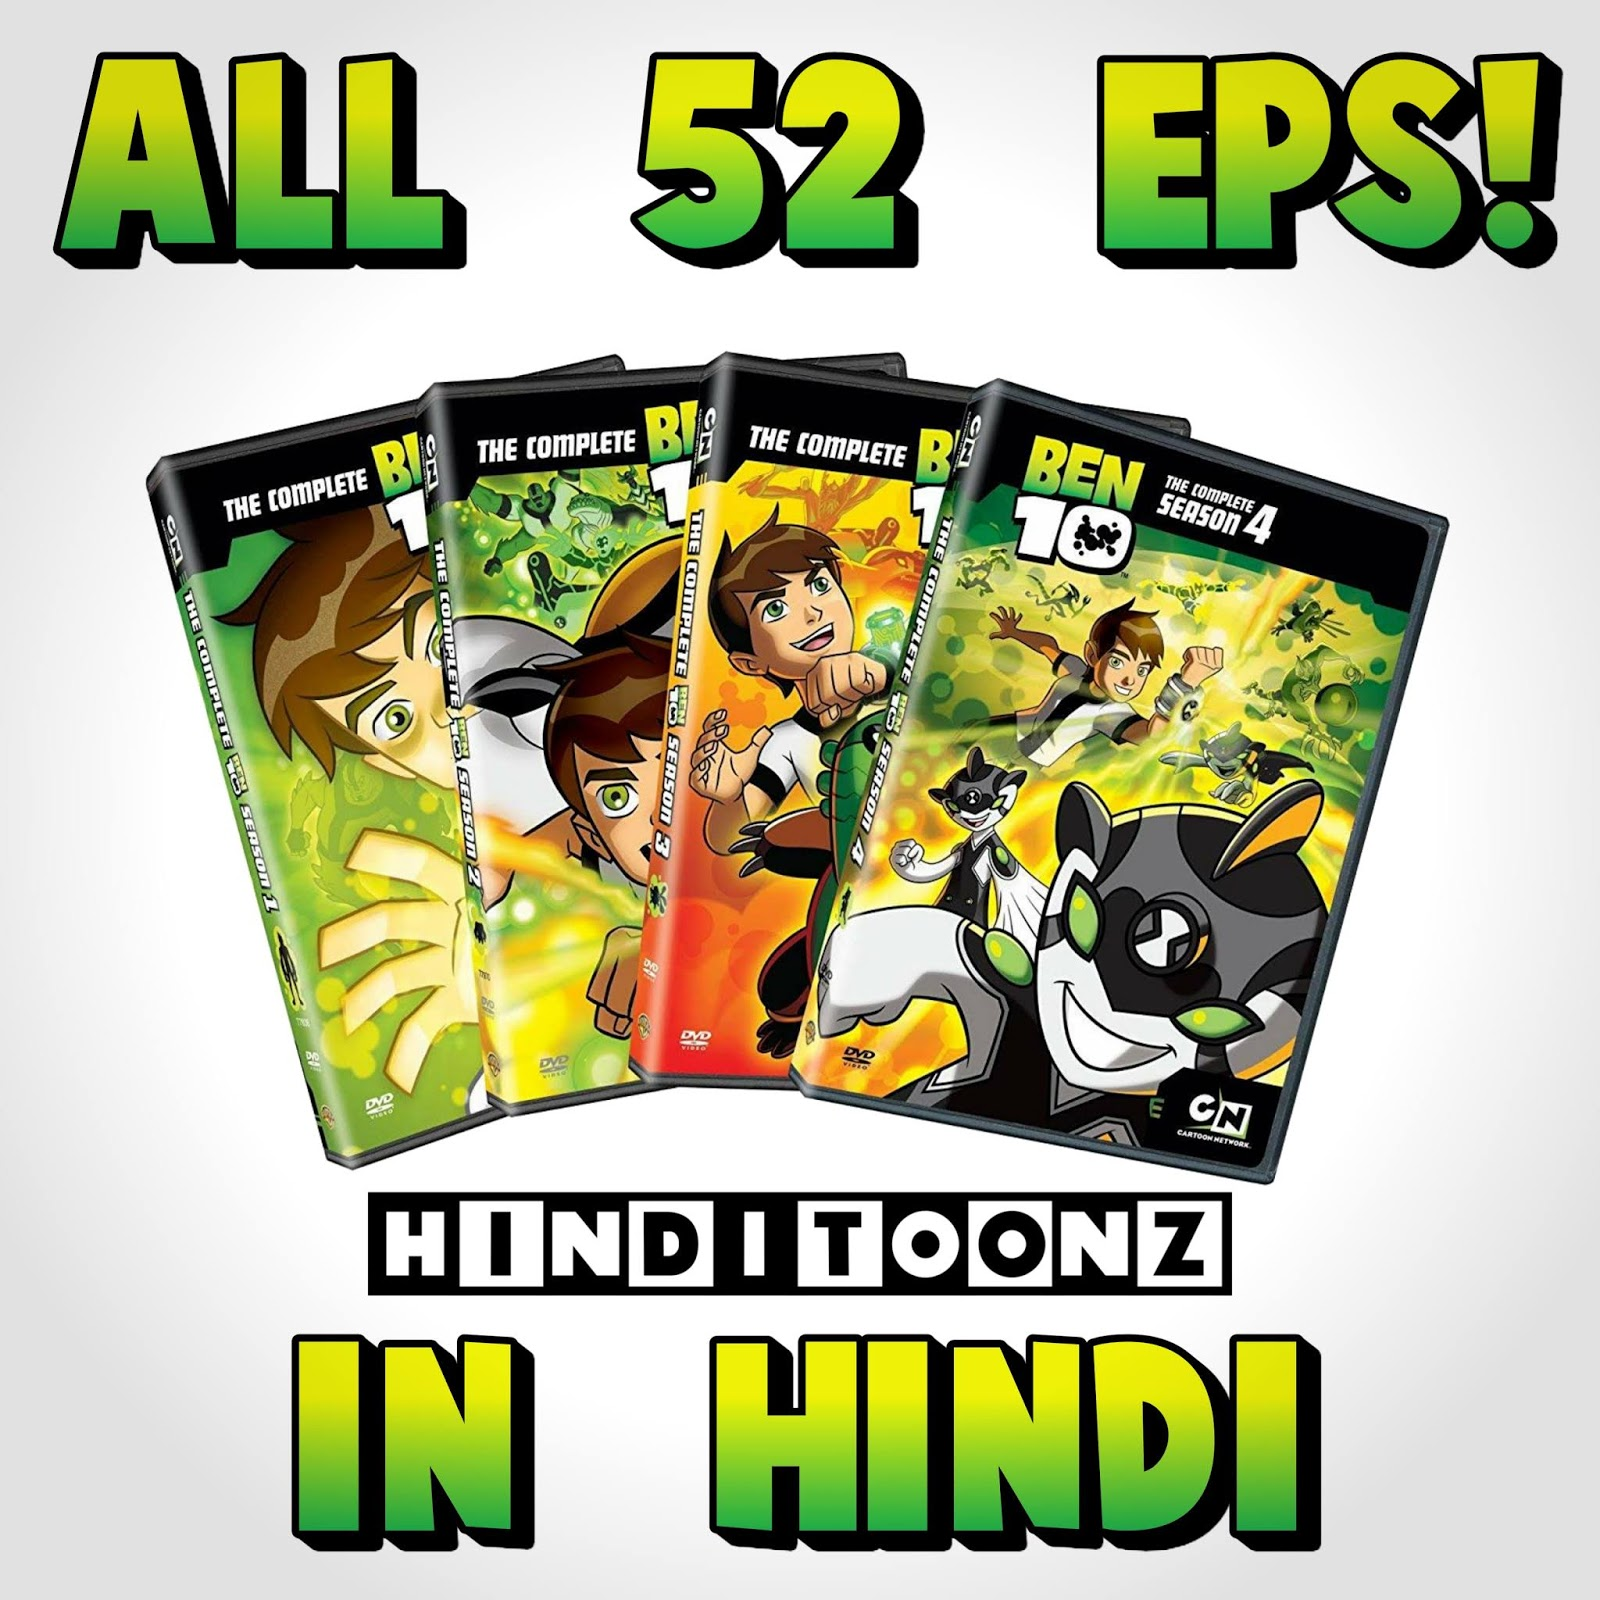 Ben 10 (Ben 10 Classic – 2005) Hindi Dubbed Episodes Download